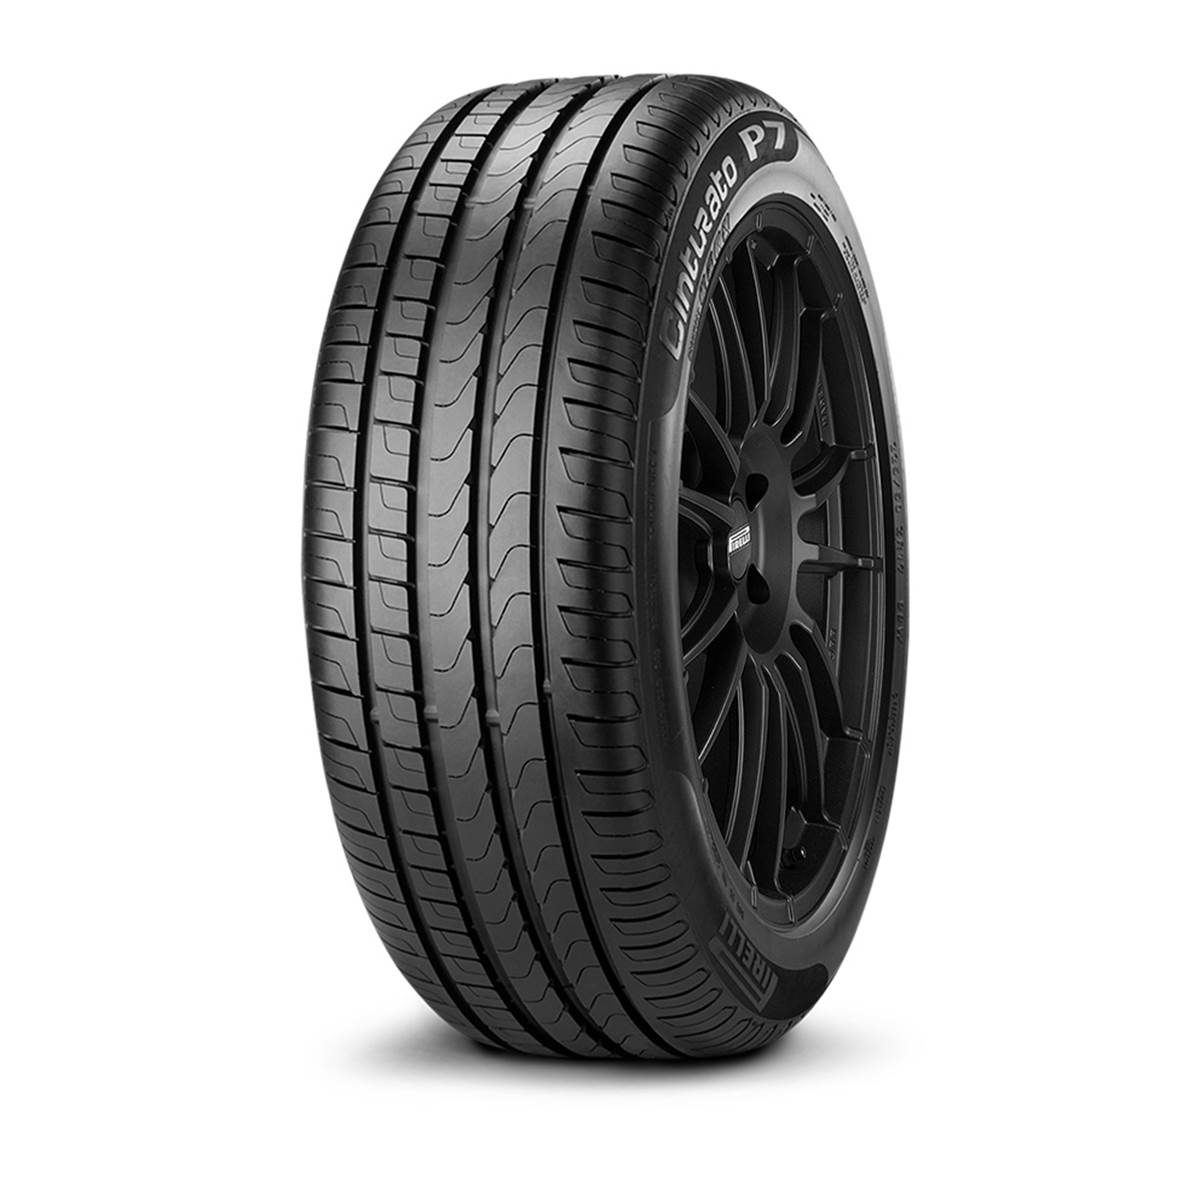 Pneu Pirelli 215/55R17 94V Cinturato P7